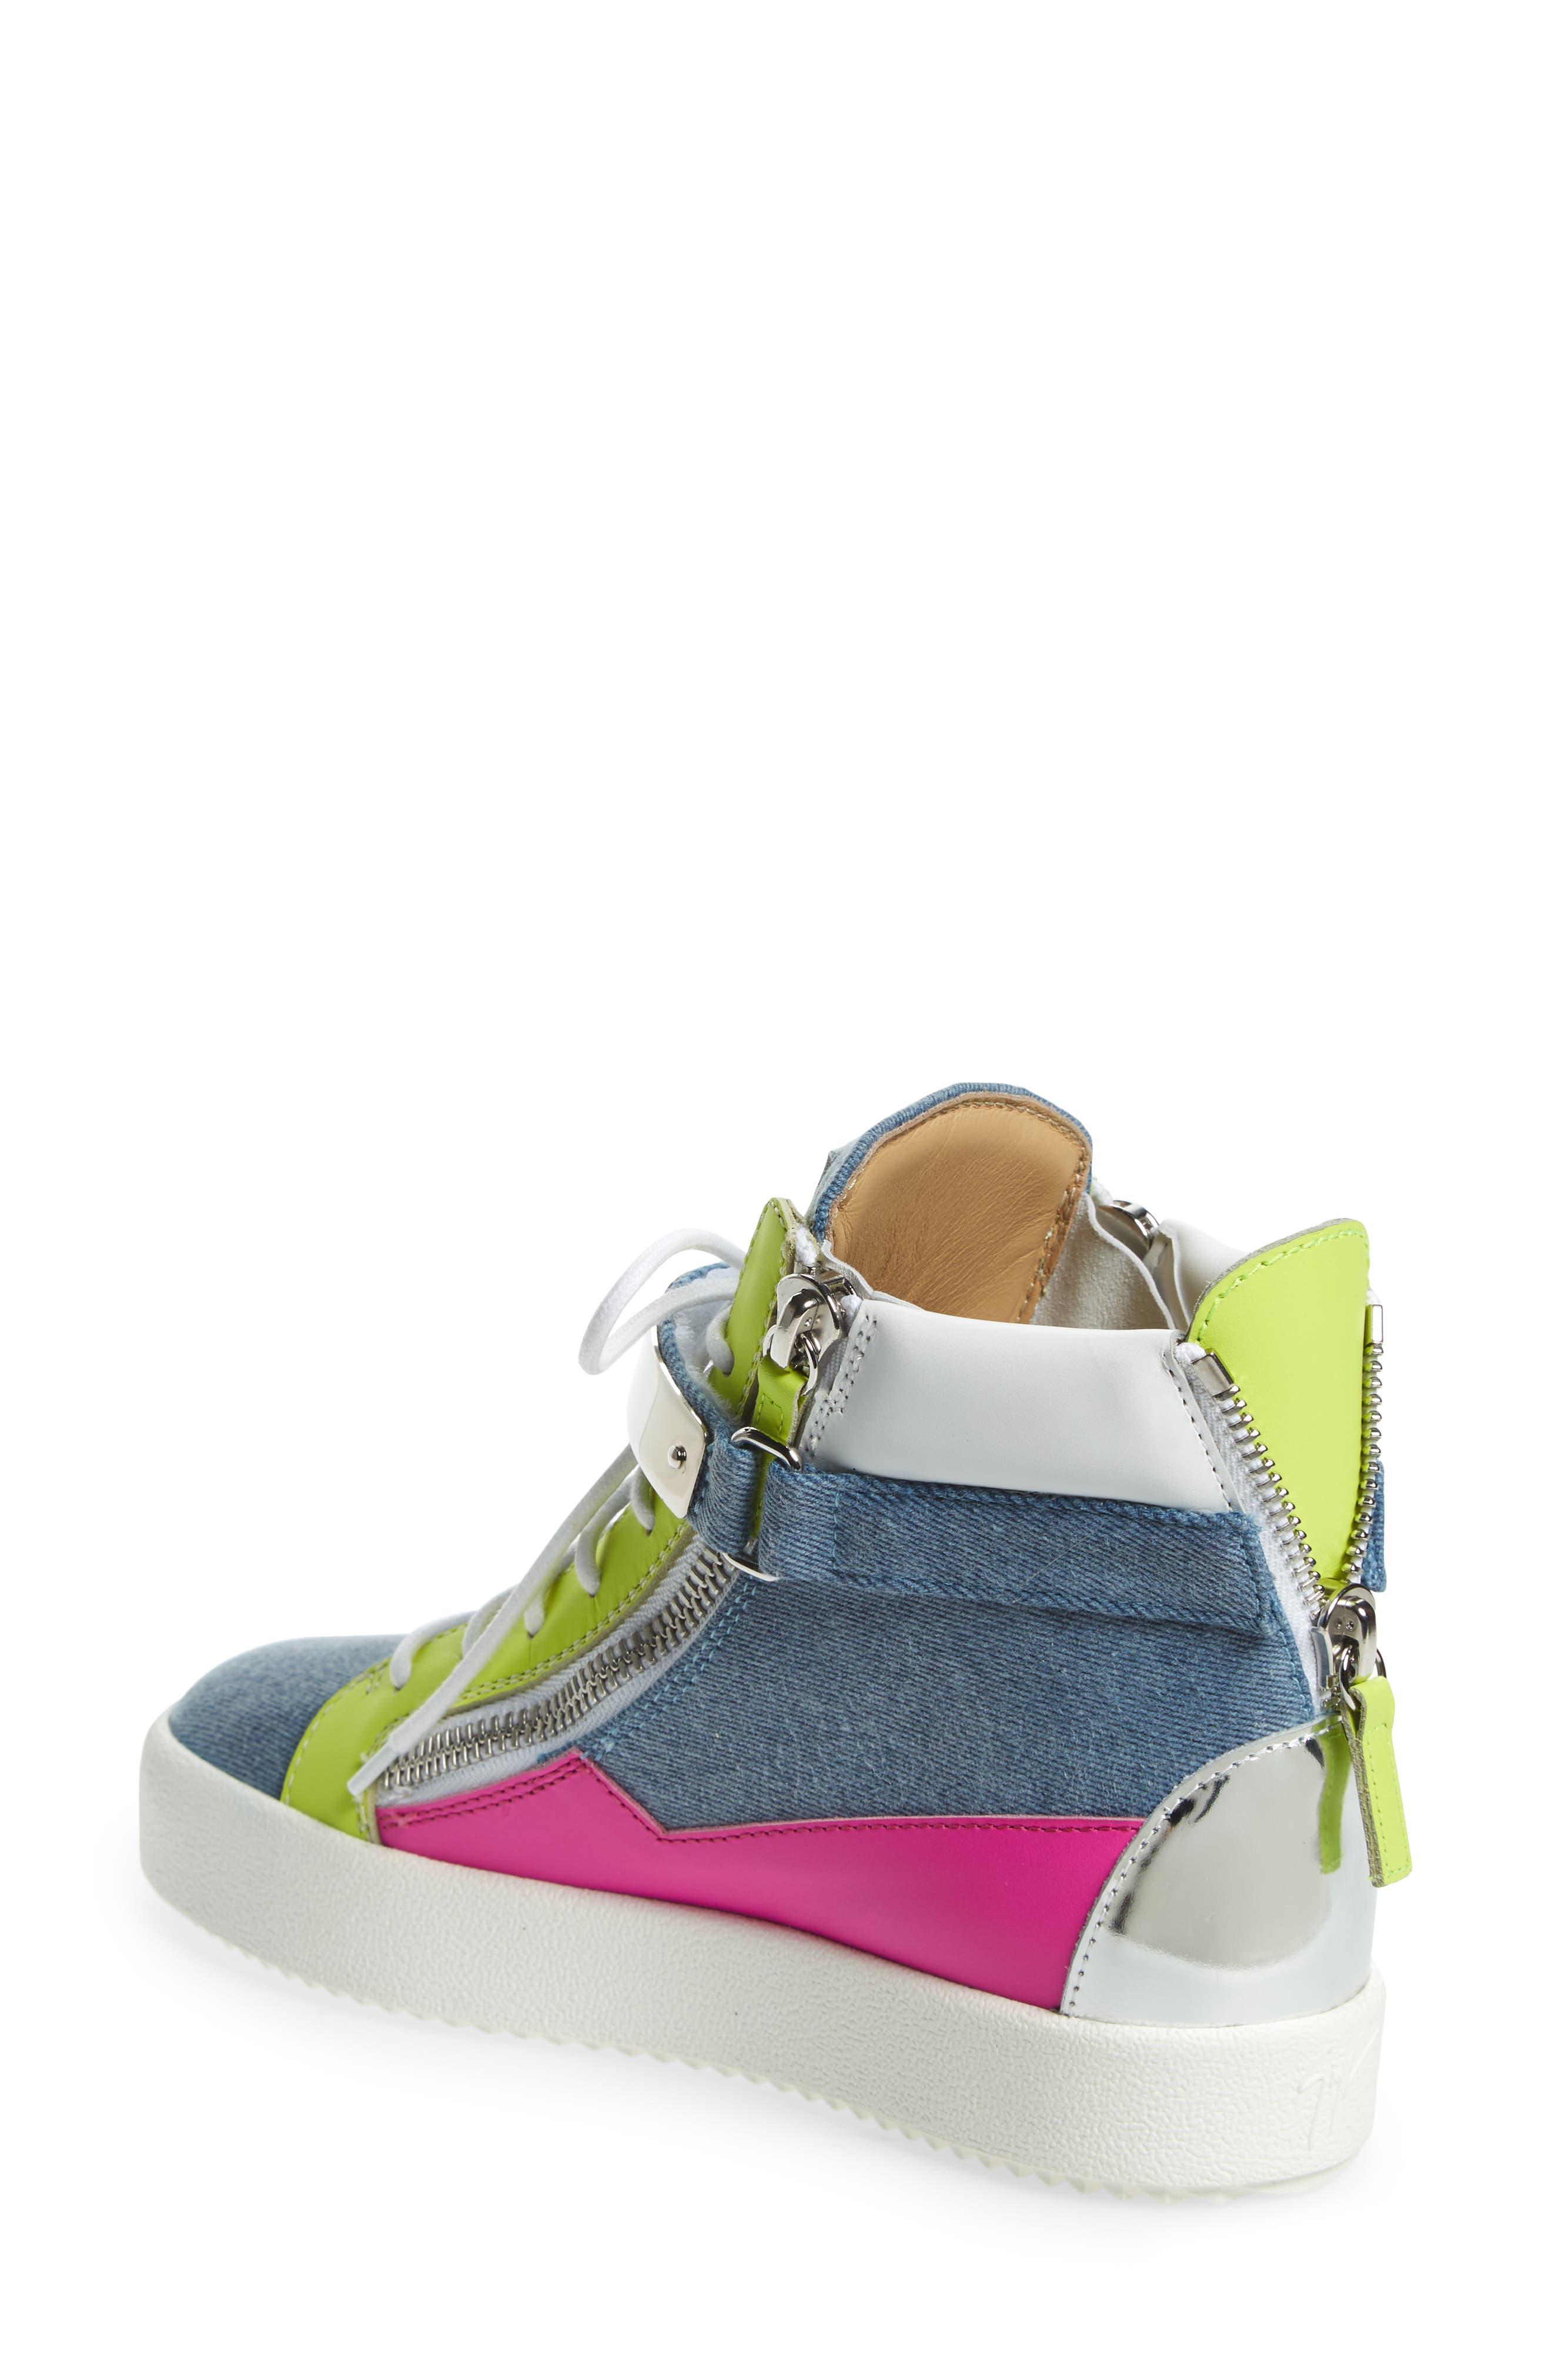 May London High Top Sneaker,                             Alternate thumbnail 2, color,                             400